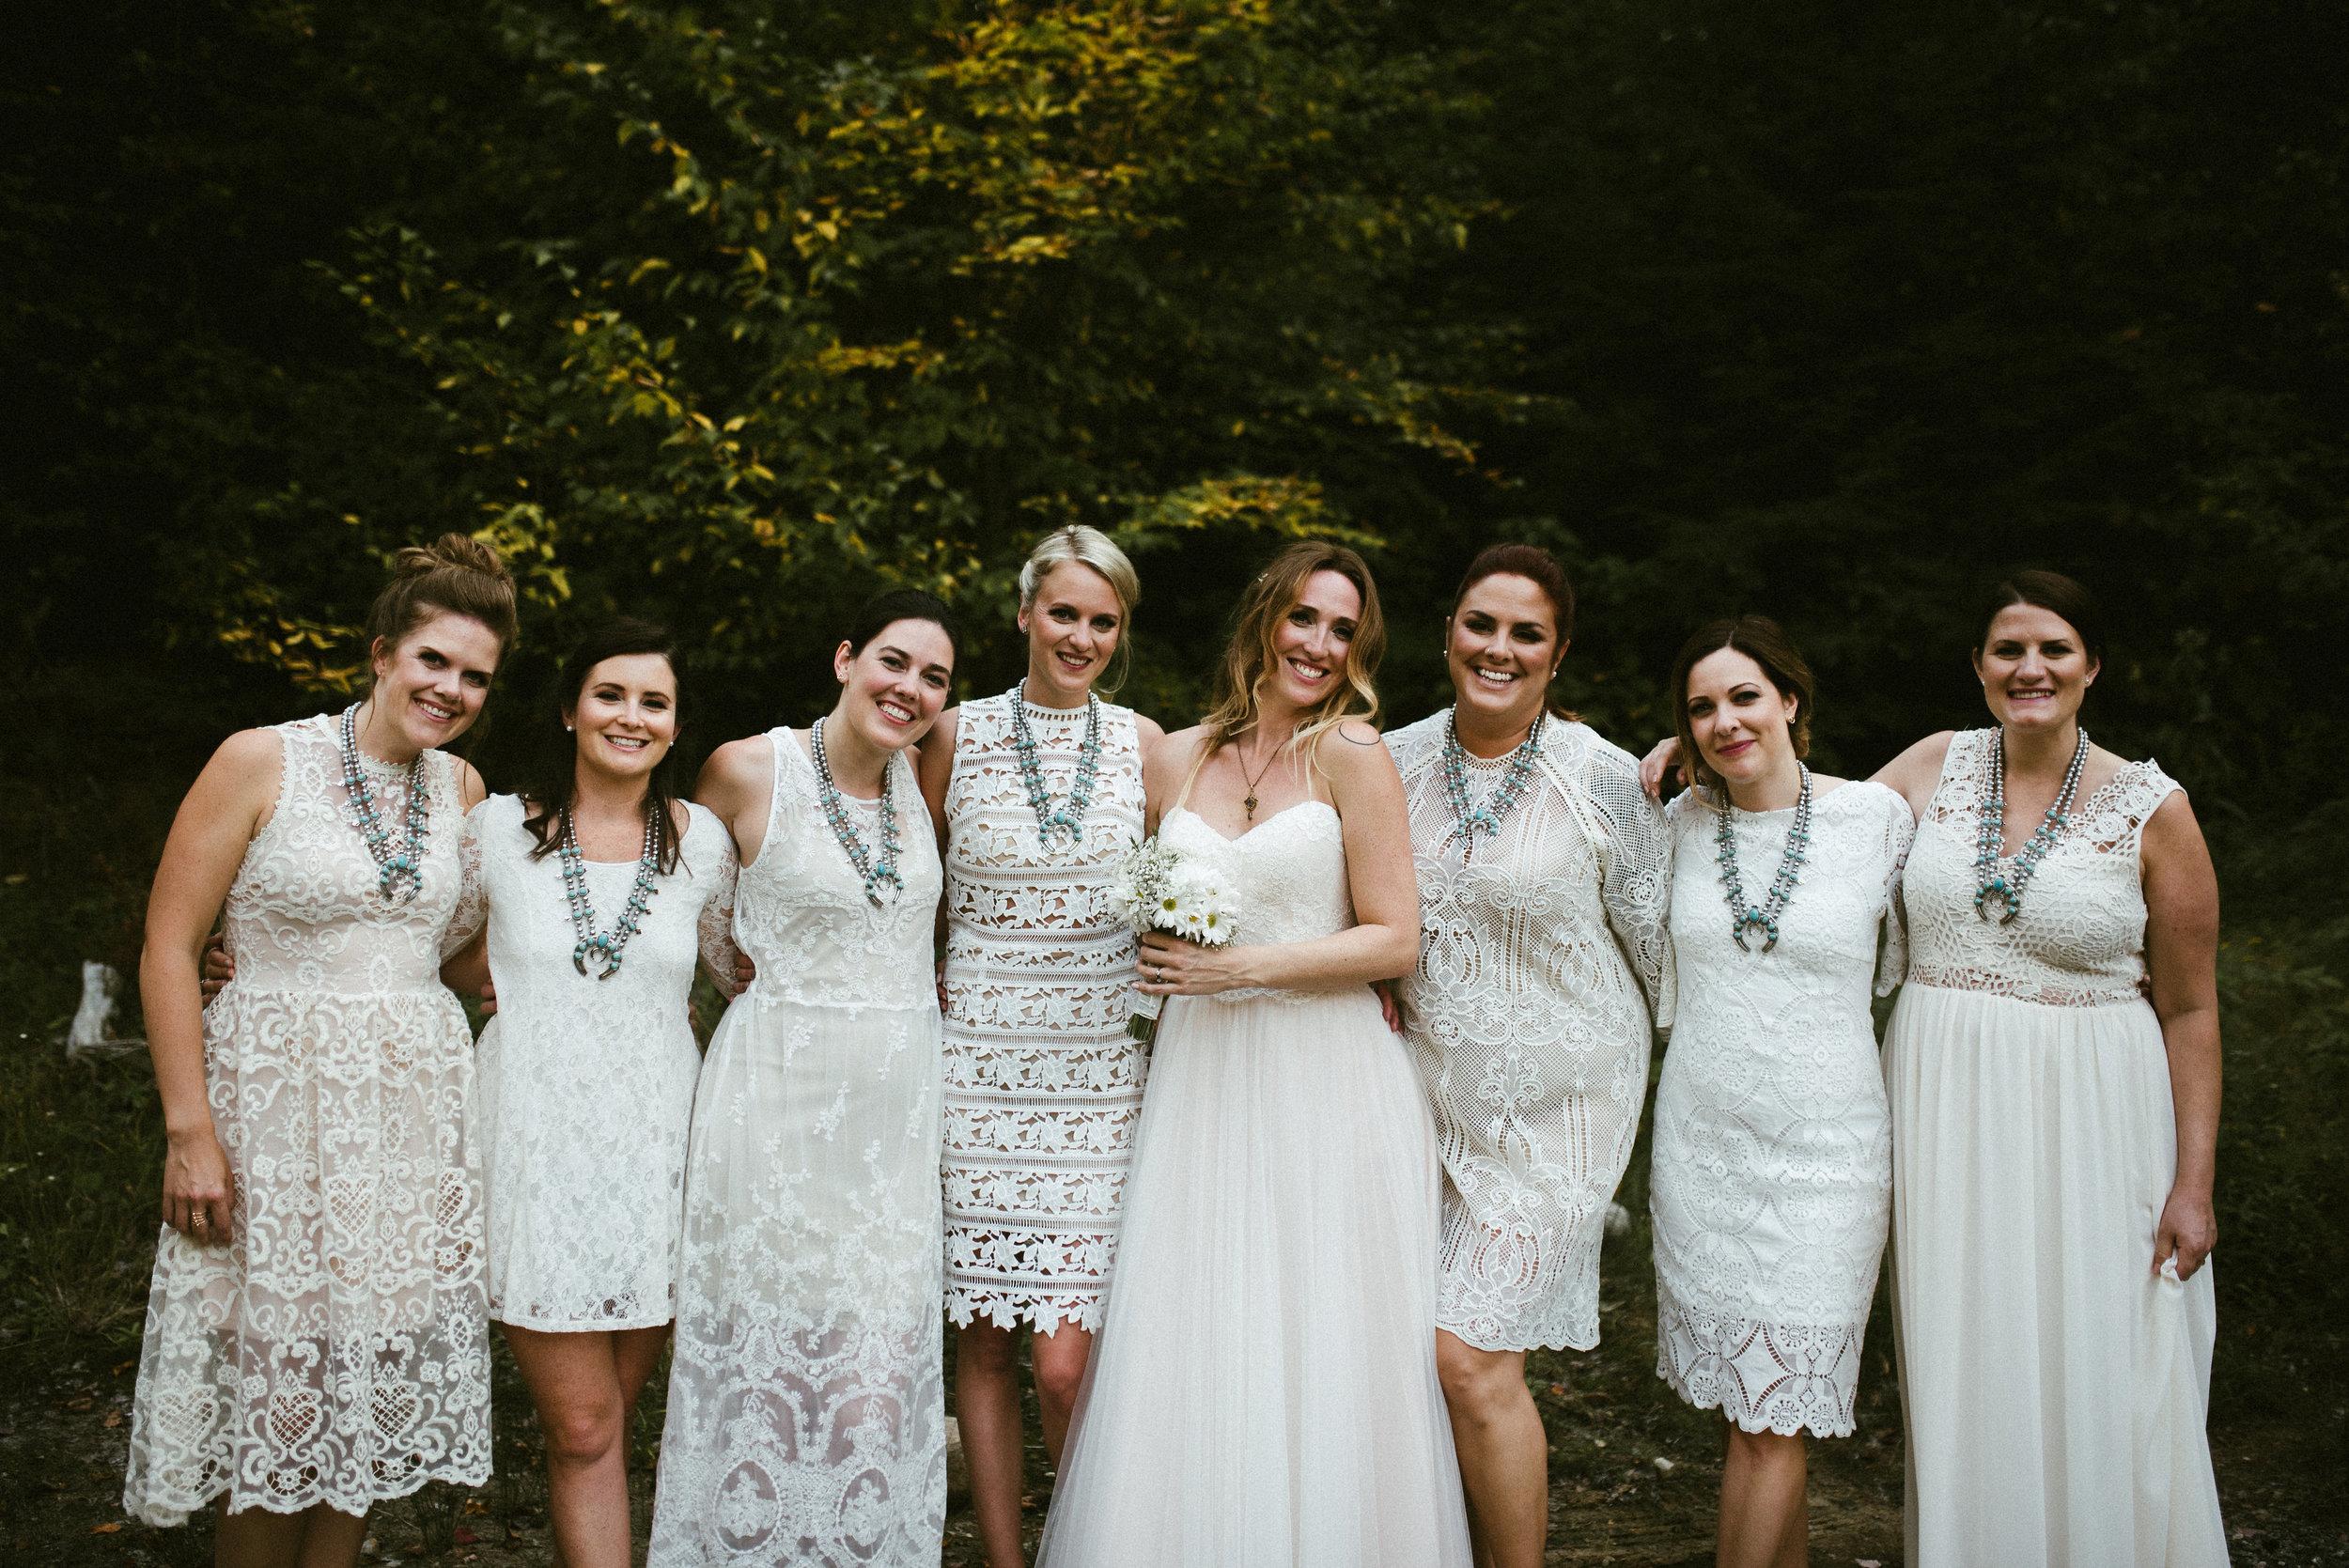 Laura Amaya Beauty On Location Wedding Airbrush Makeup Artist Buffalo, Ny Bridal Makeup Professional www.lauraamaya.com